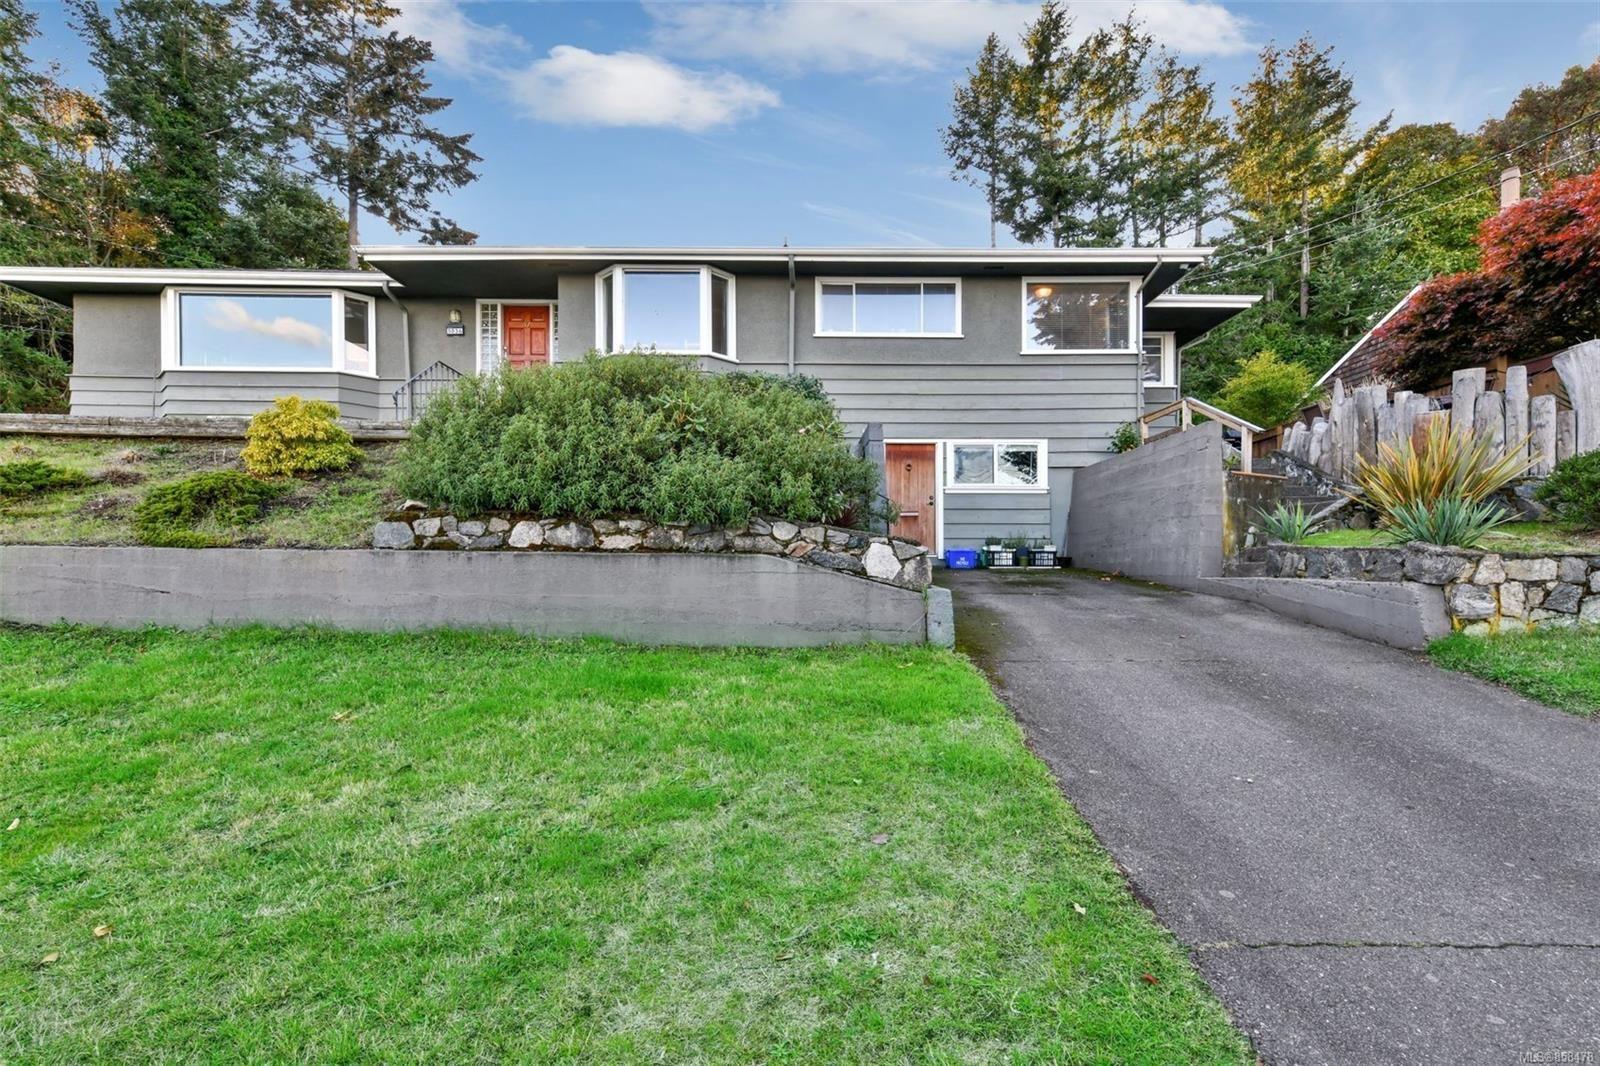 Main Photo: 5036 Lochside Dr in : SE Cordova Bay House for sale (Saanich East)  : MLS®# 858478